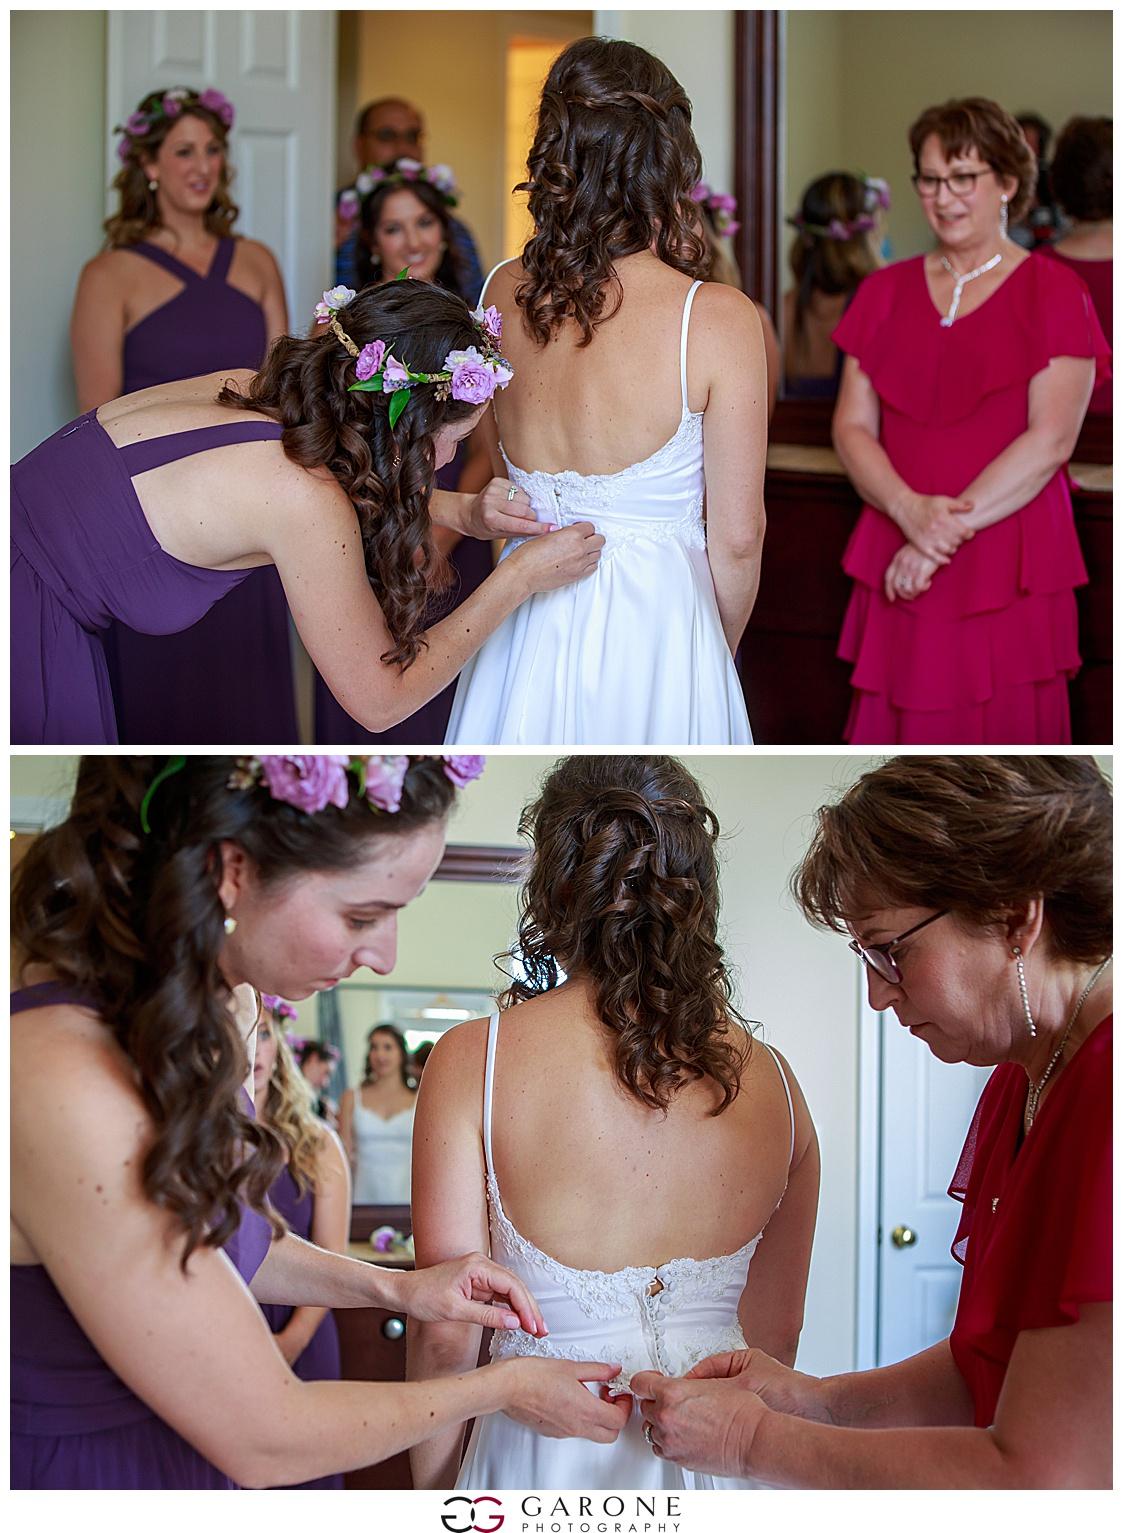 Natalie_Eric_Loon_Wedding_White_Mountain_Wedding_Photography_Garone_Photography_0006.jpg